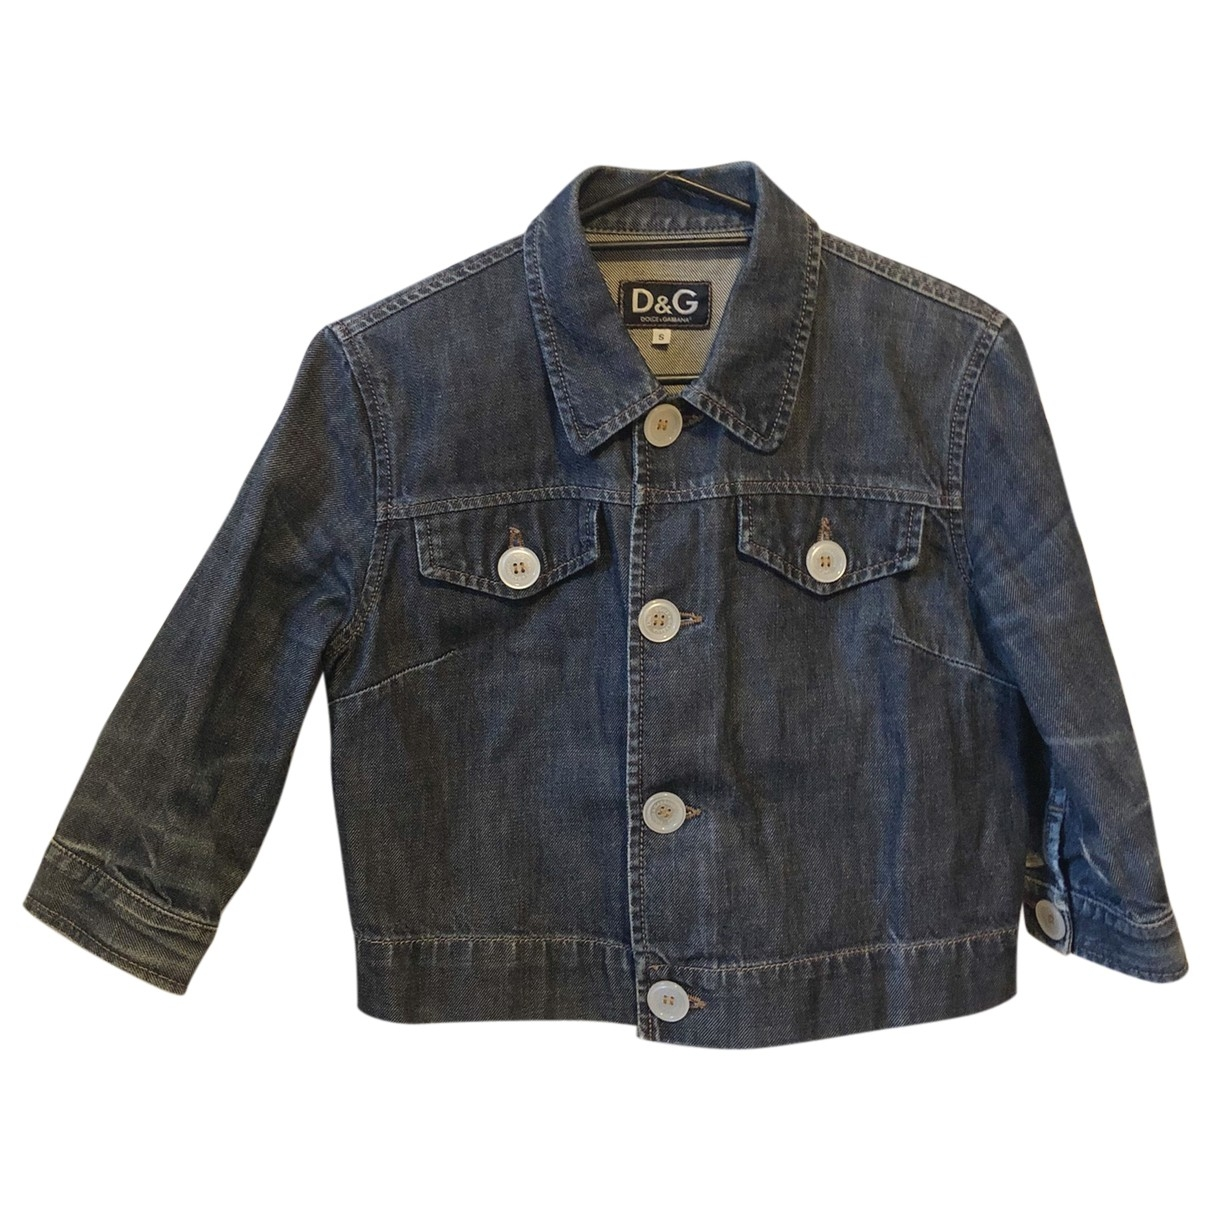 D&g \N Blue Denim - Jeans jacket for Women S International